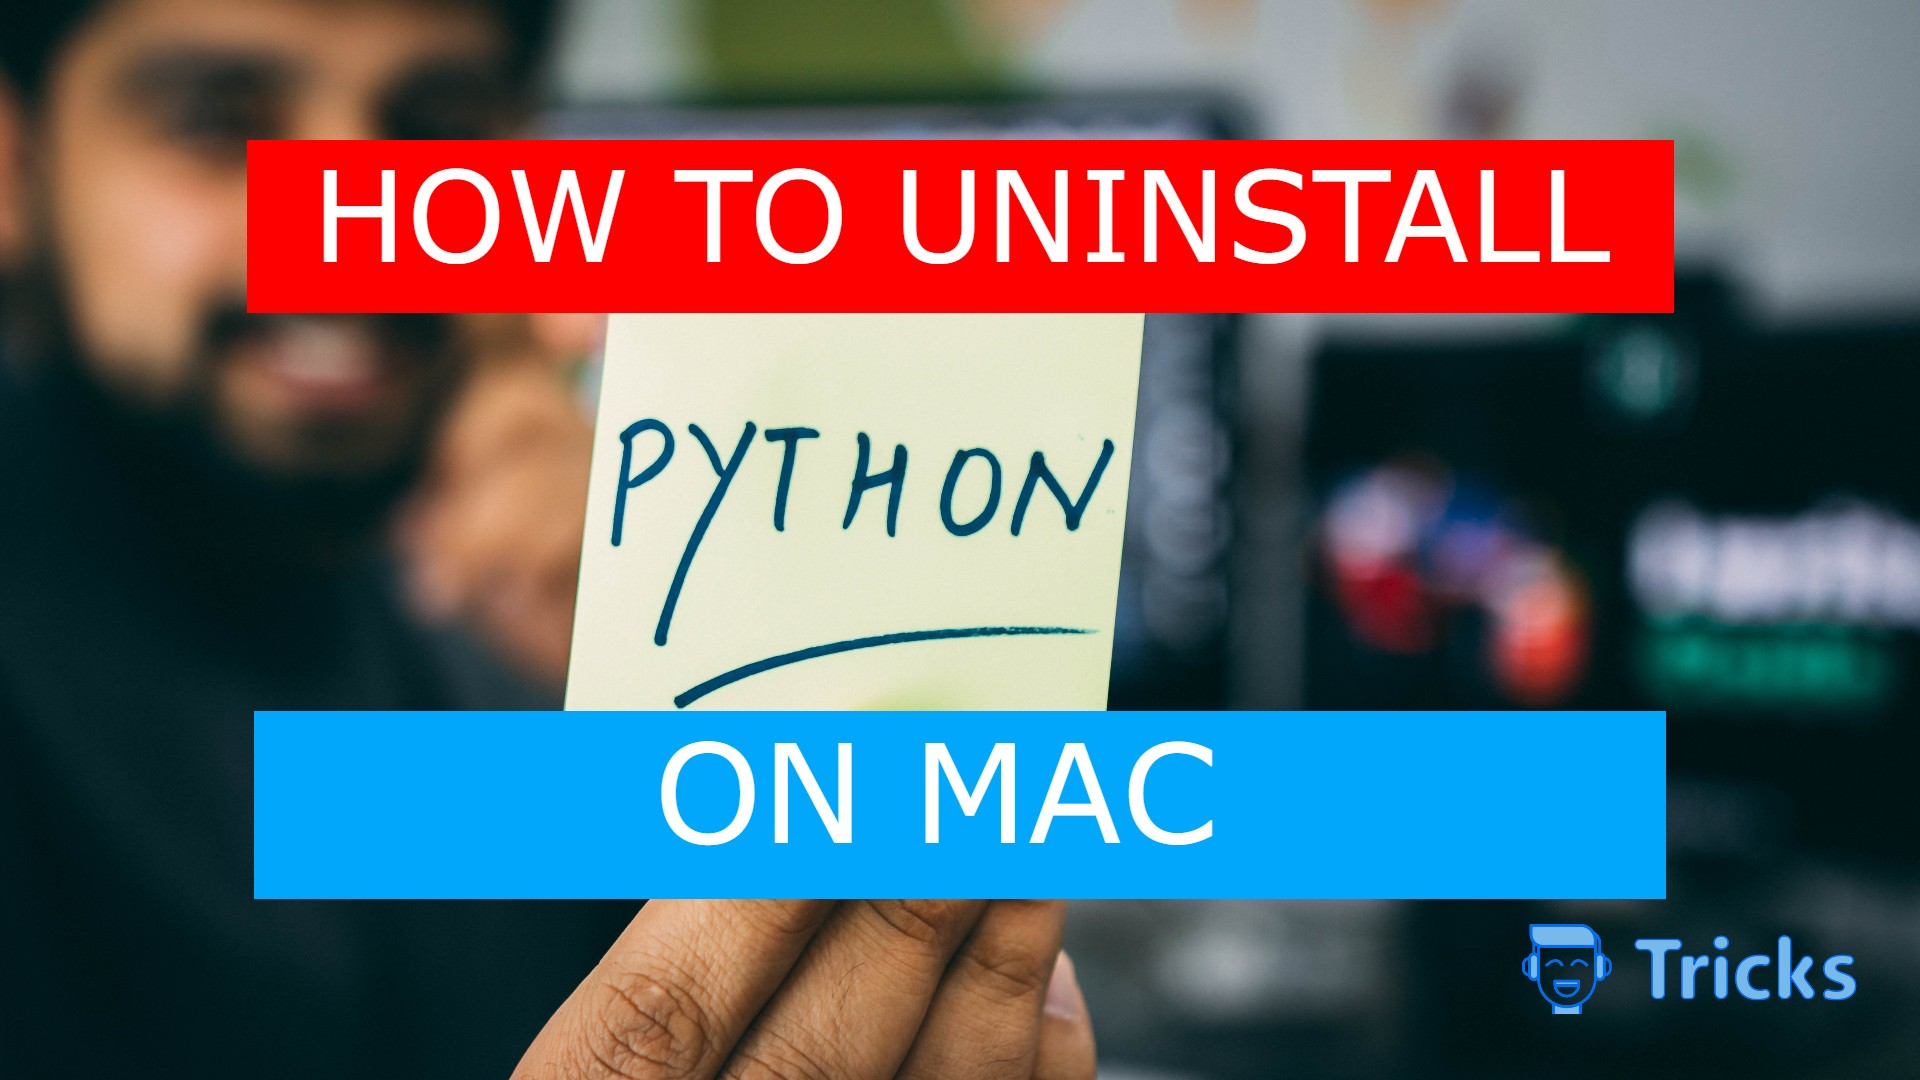 How to uninstall python on mac